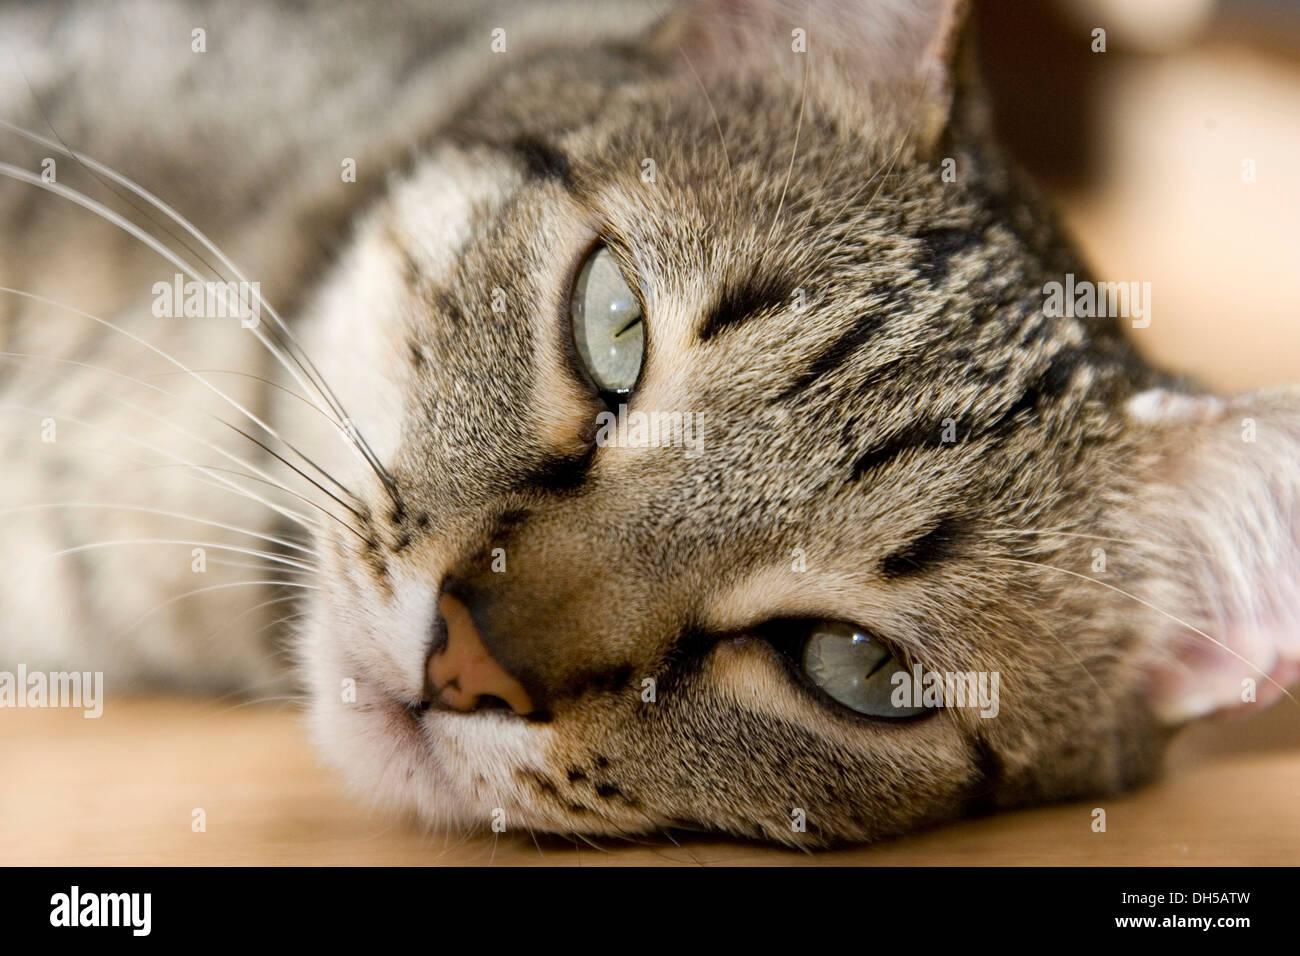 Domestic cat, male cat taking a sunbath - Stock Image